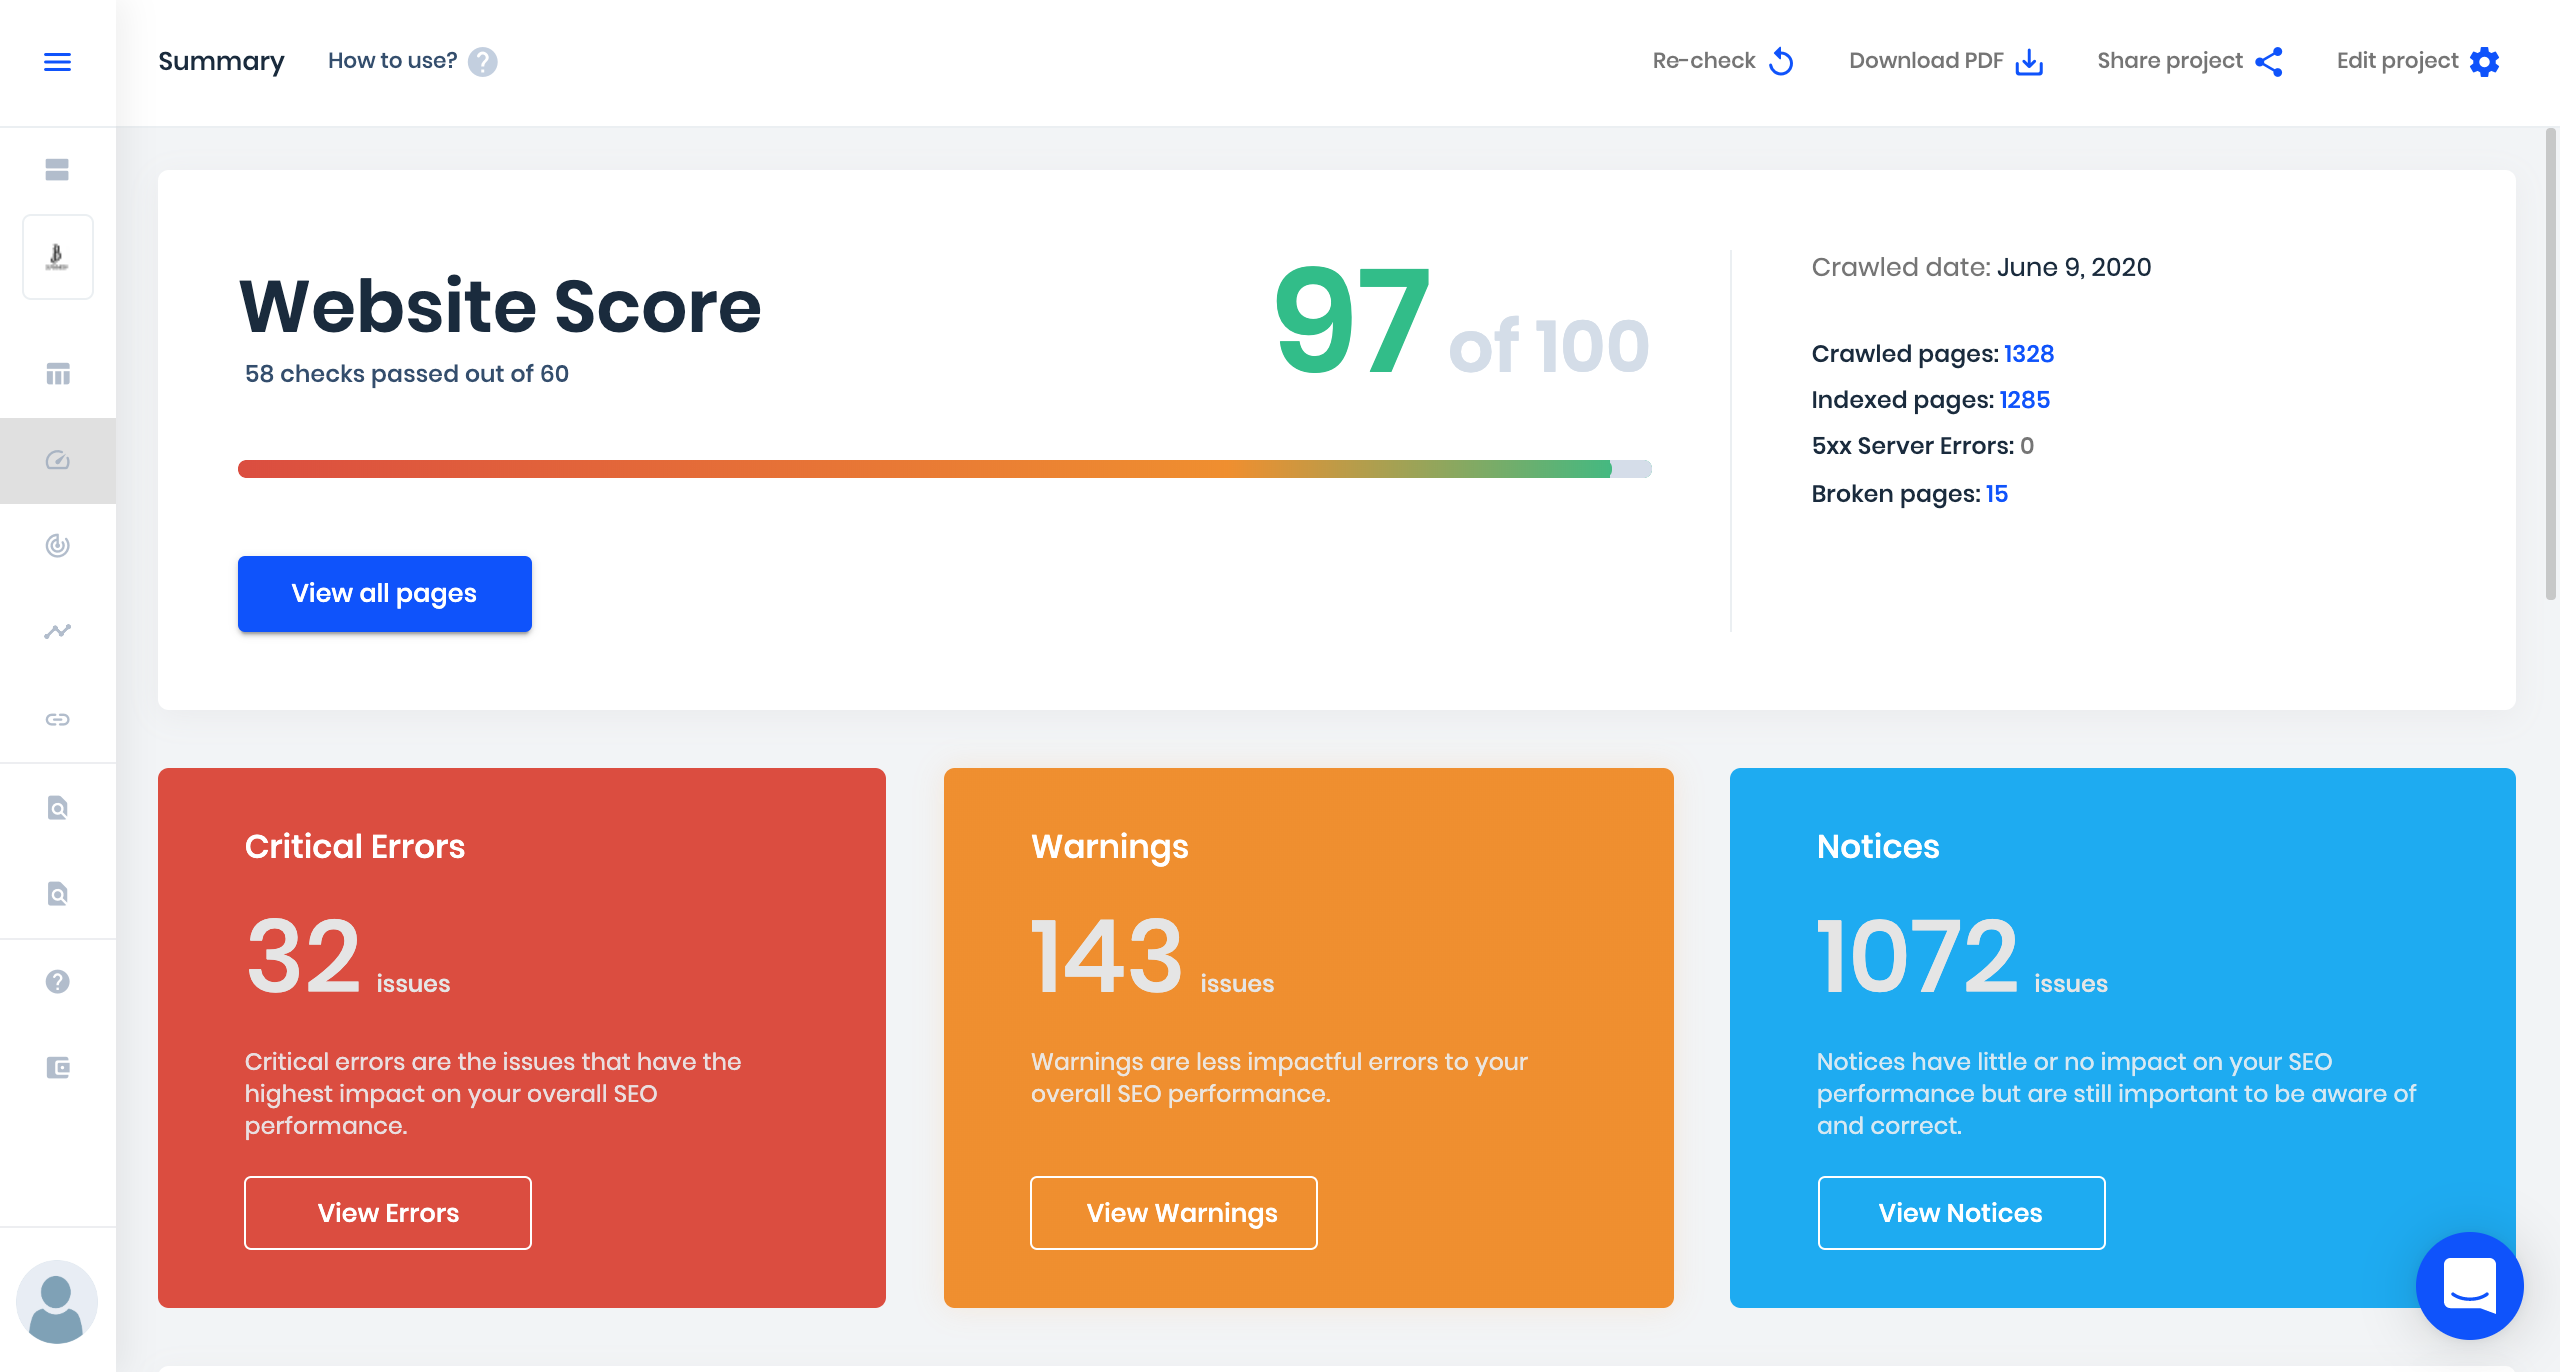 sitechecker product updates website score